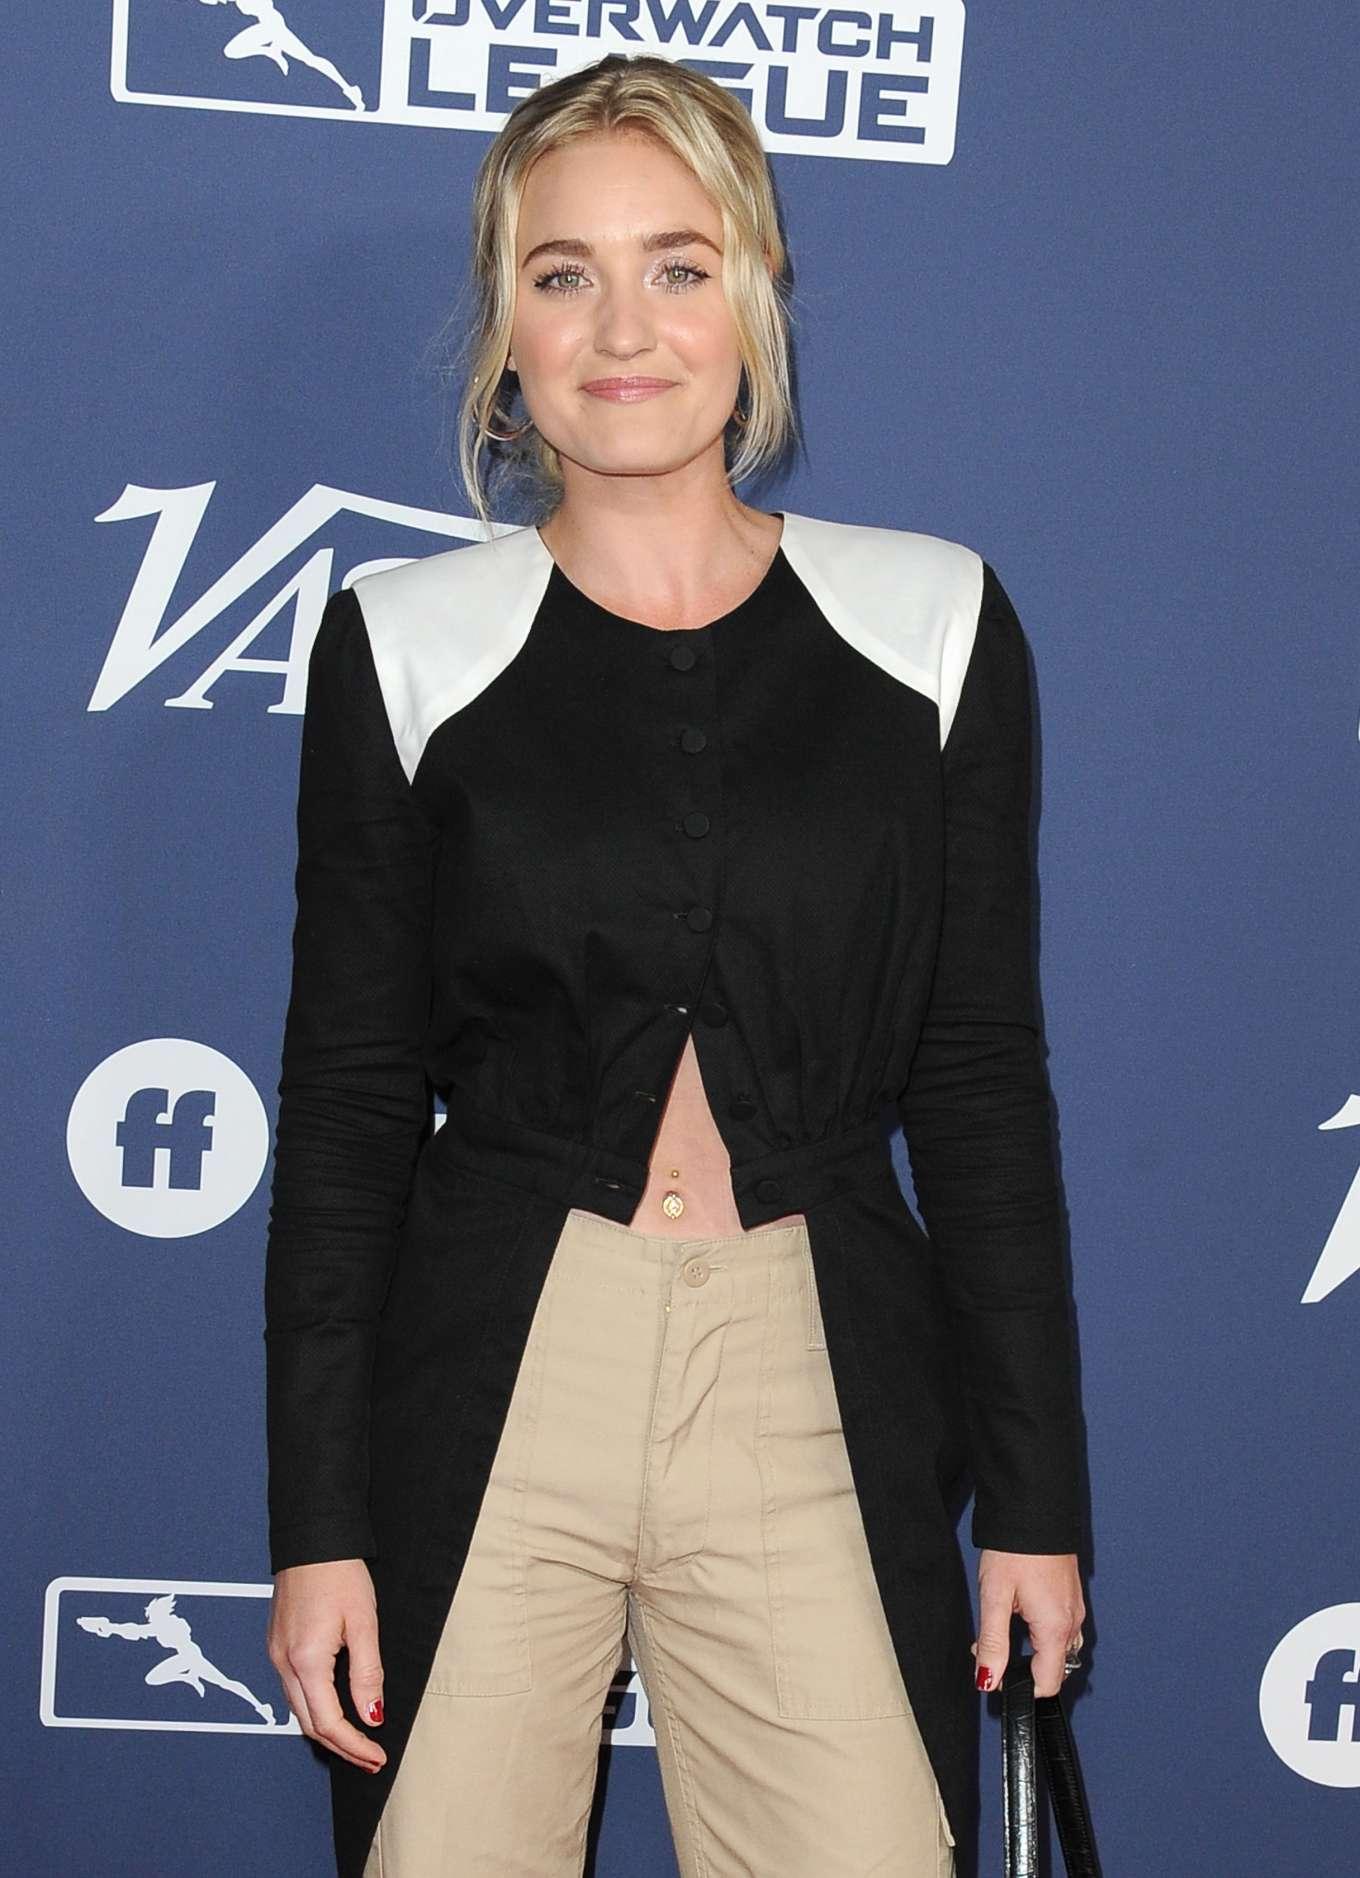 AJ Michalka 2019 : AJ Michalka – Varietys Power of Young Hollywood 2019-05